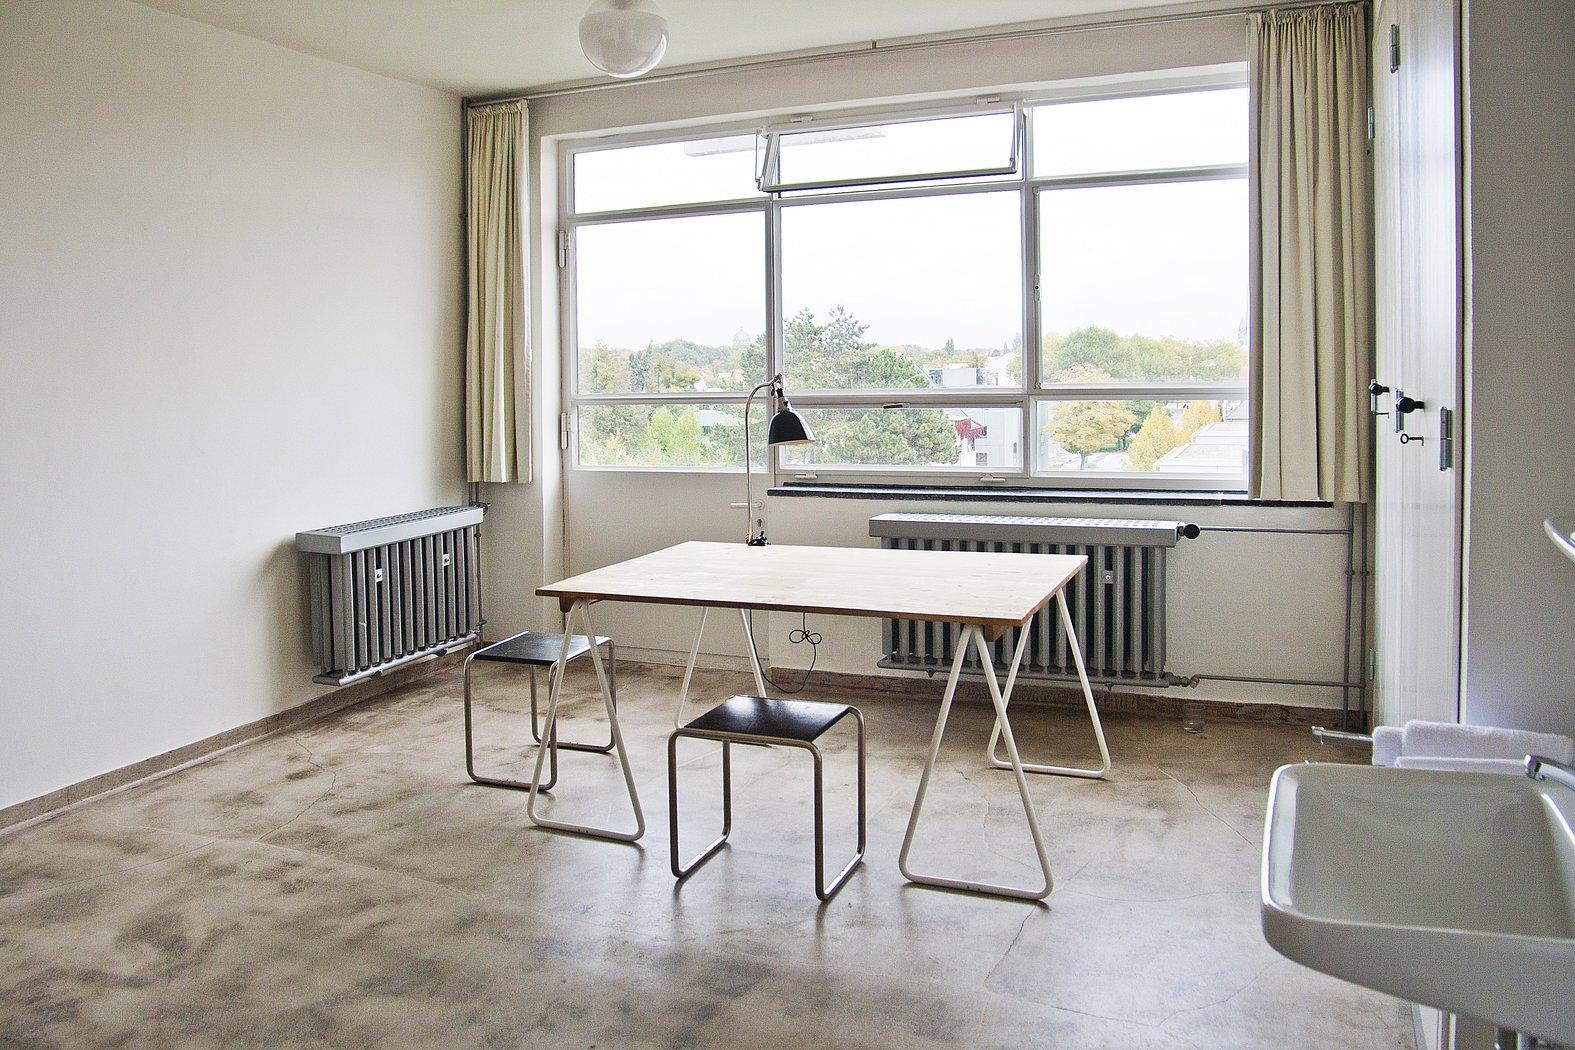 The spirit of bauhaus metalocus - Bauhaus iluminacion interior ...